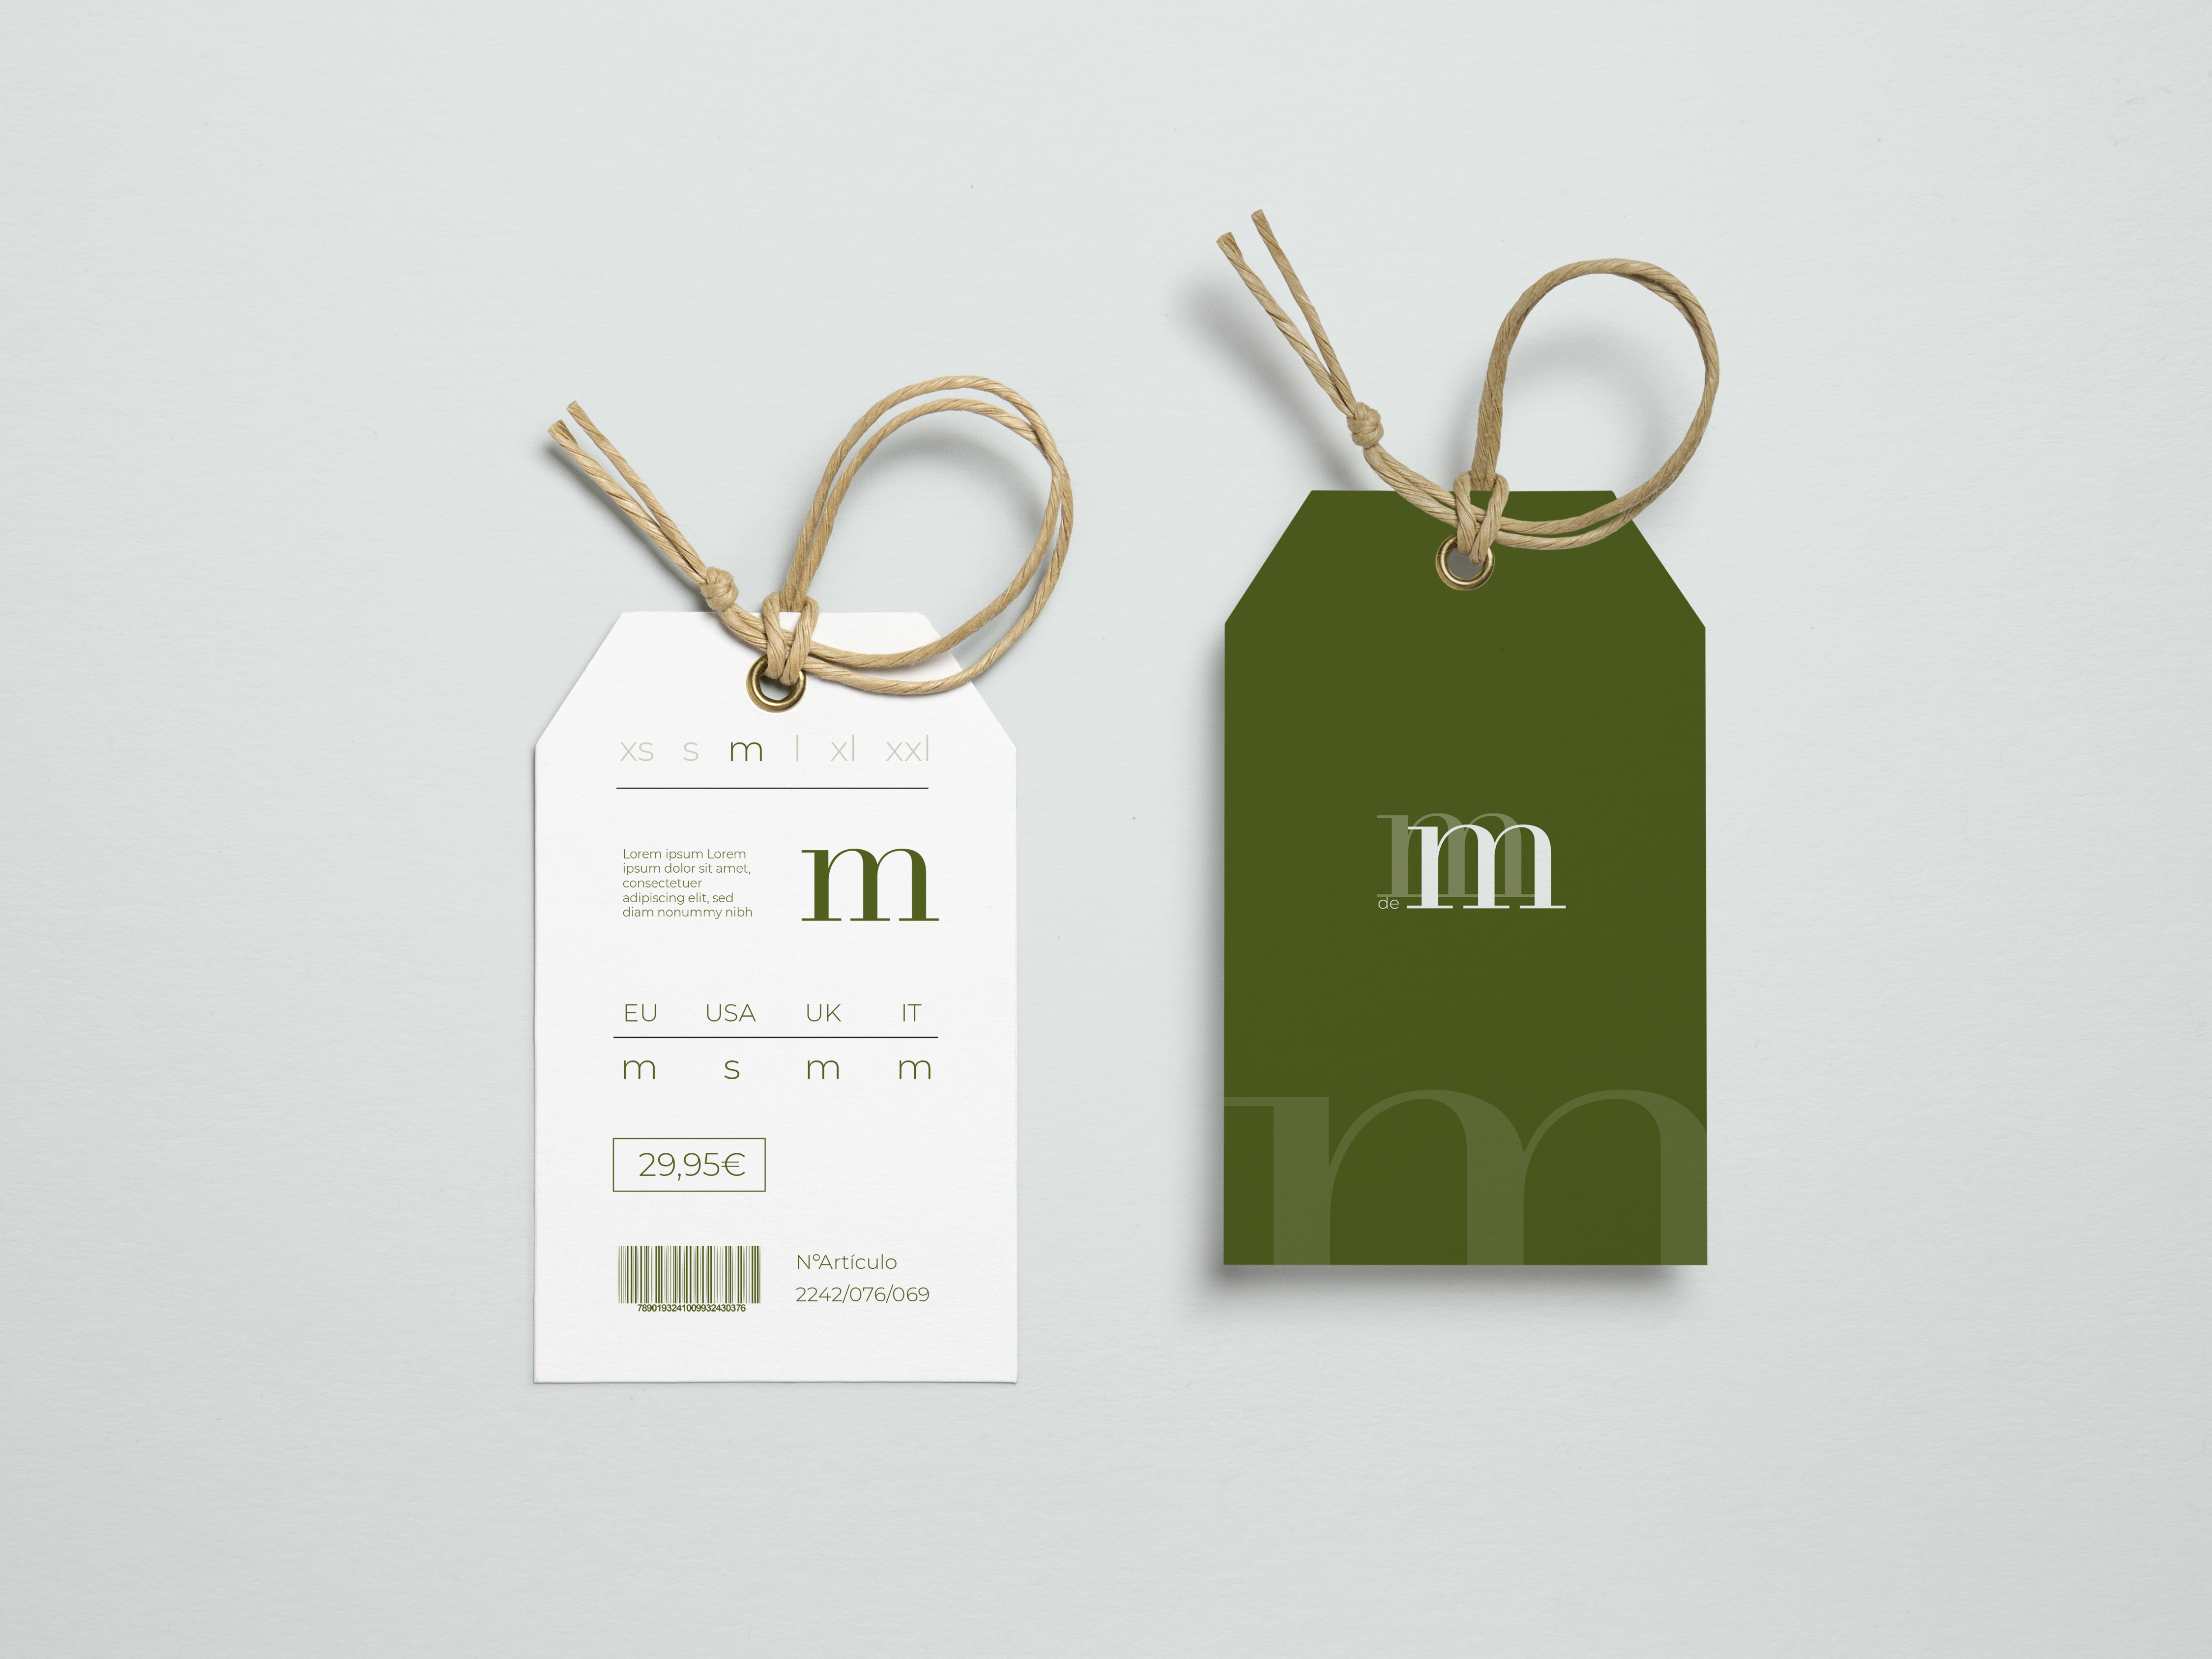 Moda de Mallorca by Nerea Vidal Muñoz - Creative Work - $i